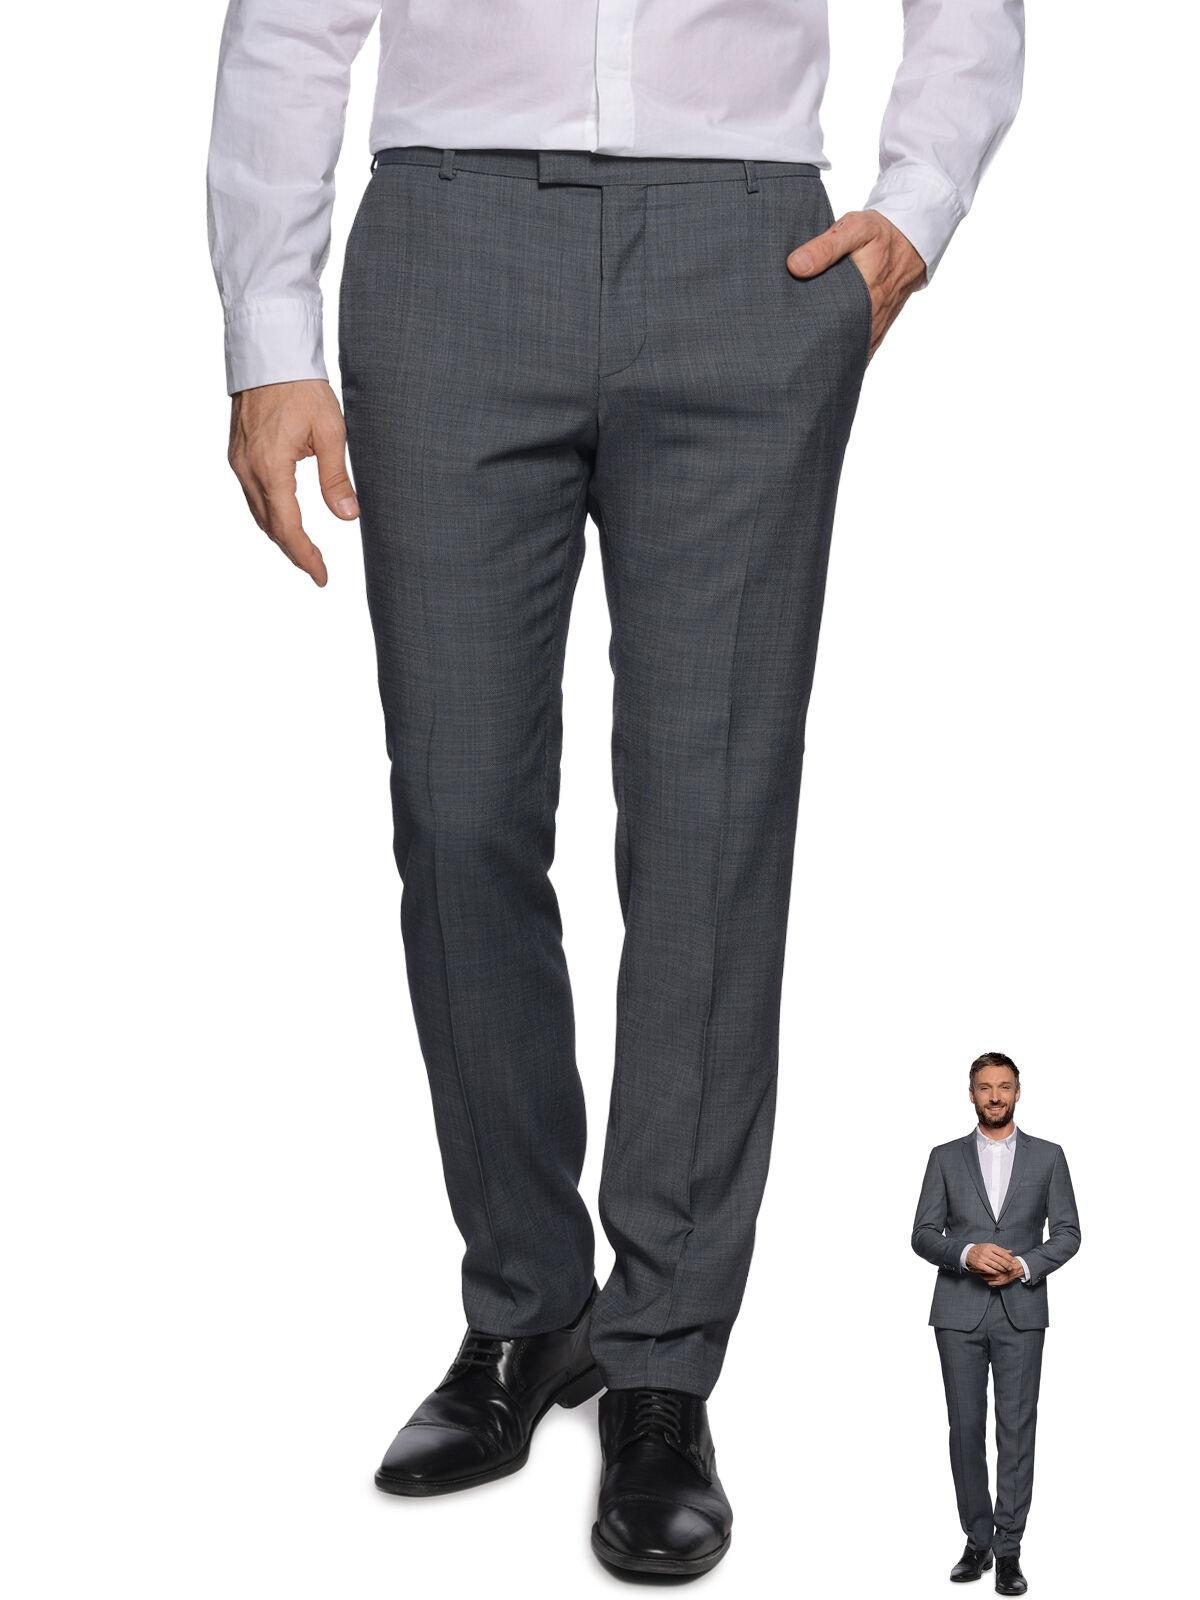 Mercer Trousers